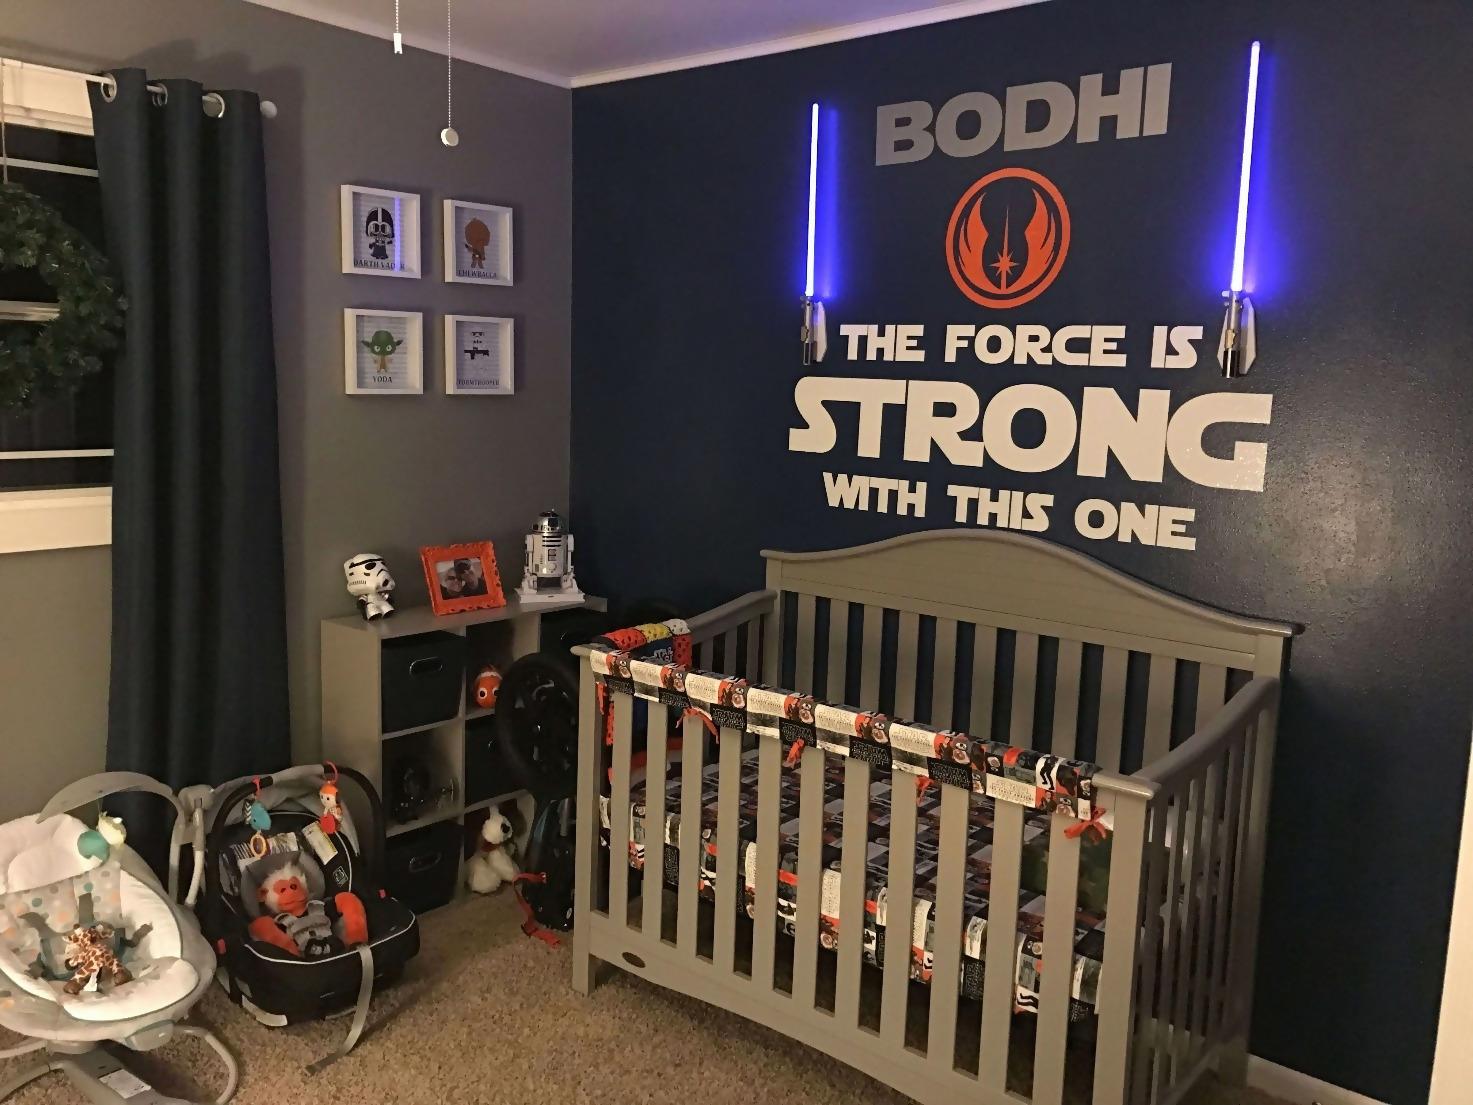 Cool Star Wars Bedroom Decor Ideas Star Wars Baby Room Star